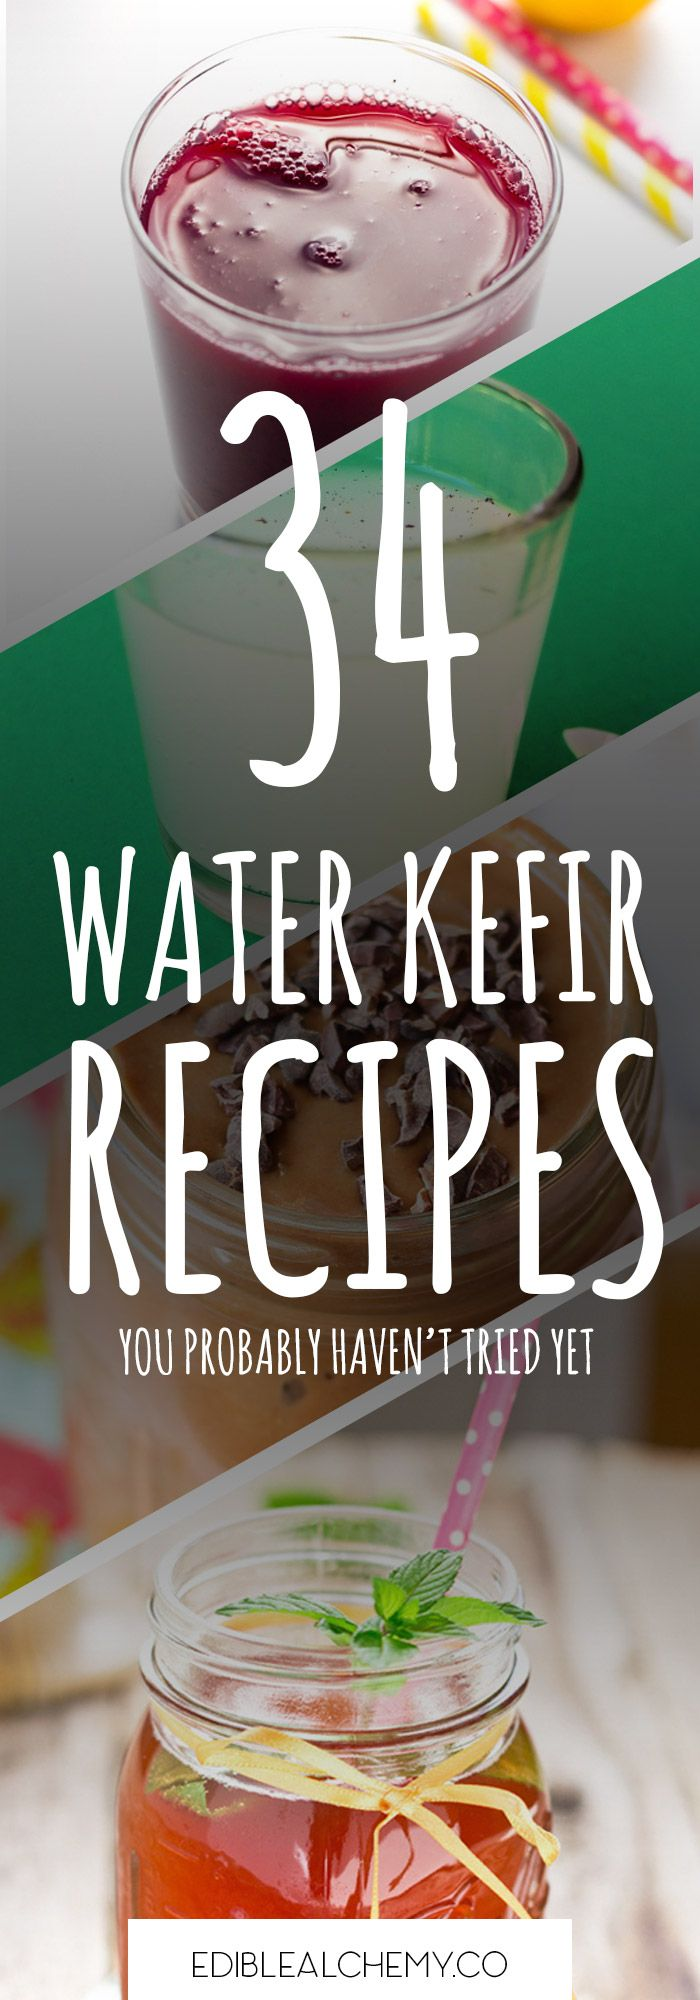 34 water kefir recipes